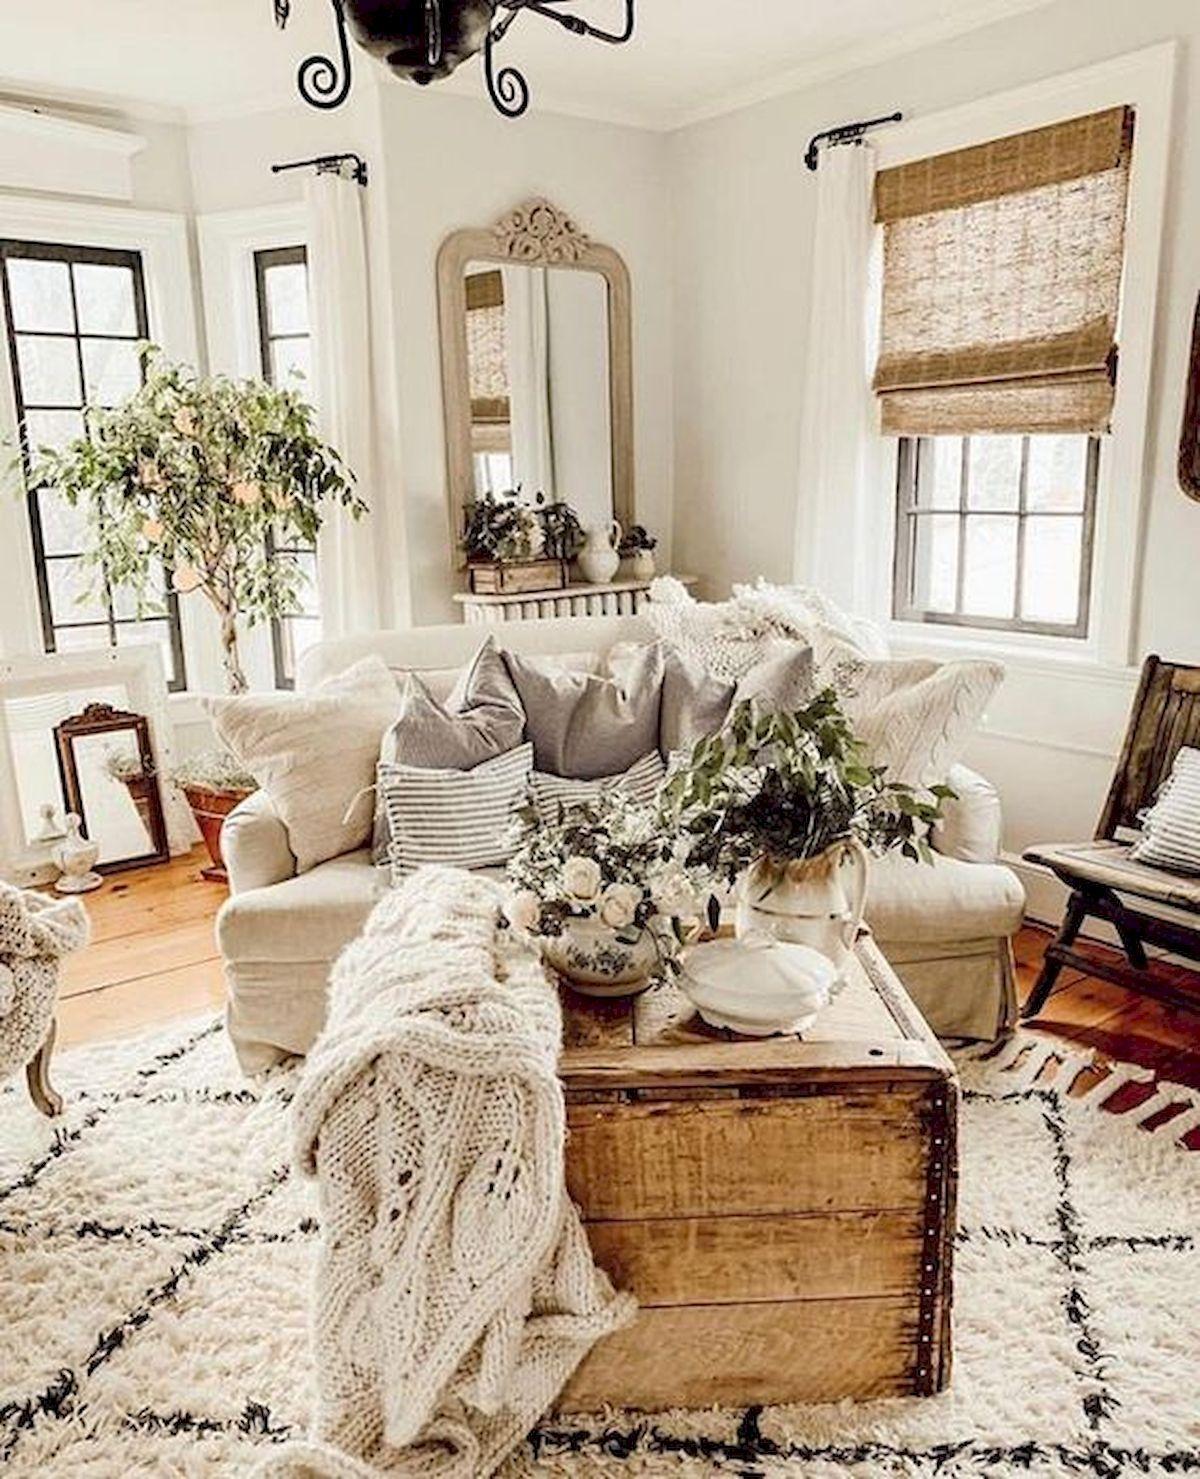 50 Cozy Farmhouse Living Room Design And Decor Ideas Farmhouse